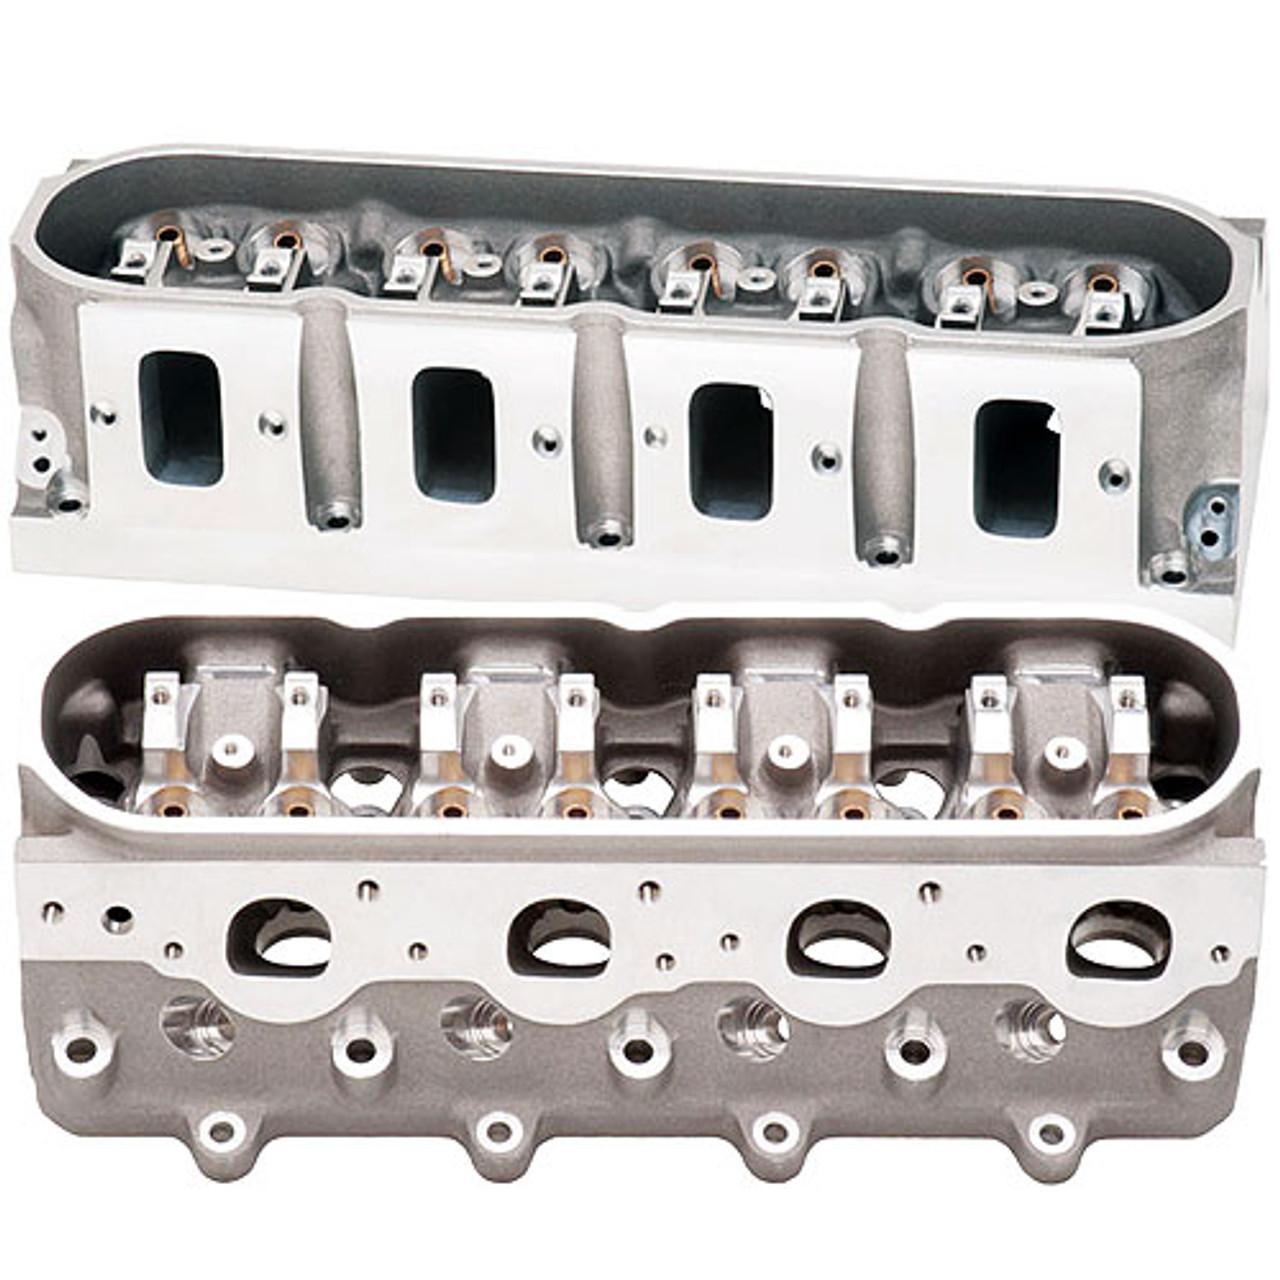 Brodix BP BR3 LS3 15 Degree CNC Ported Cylinder Heads   Assembled